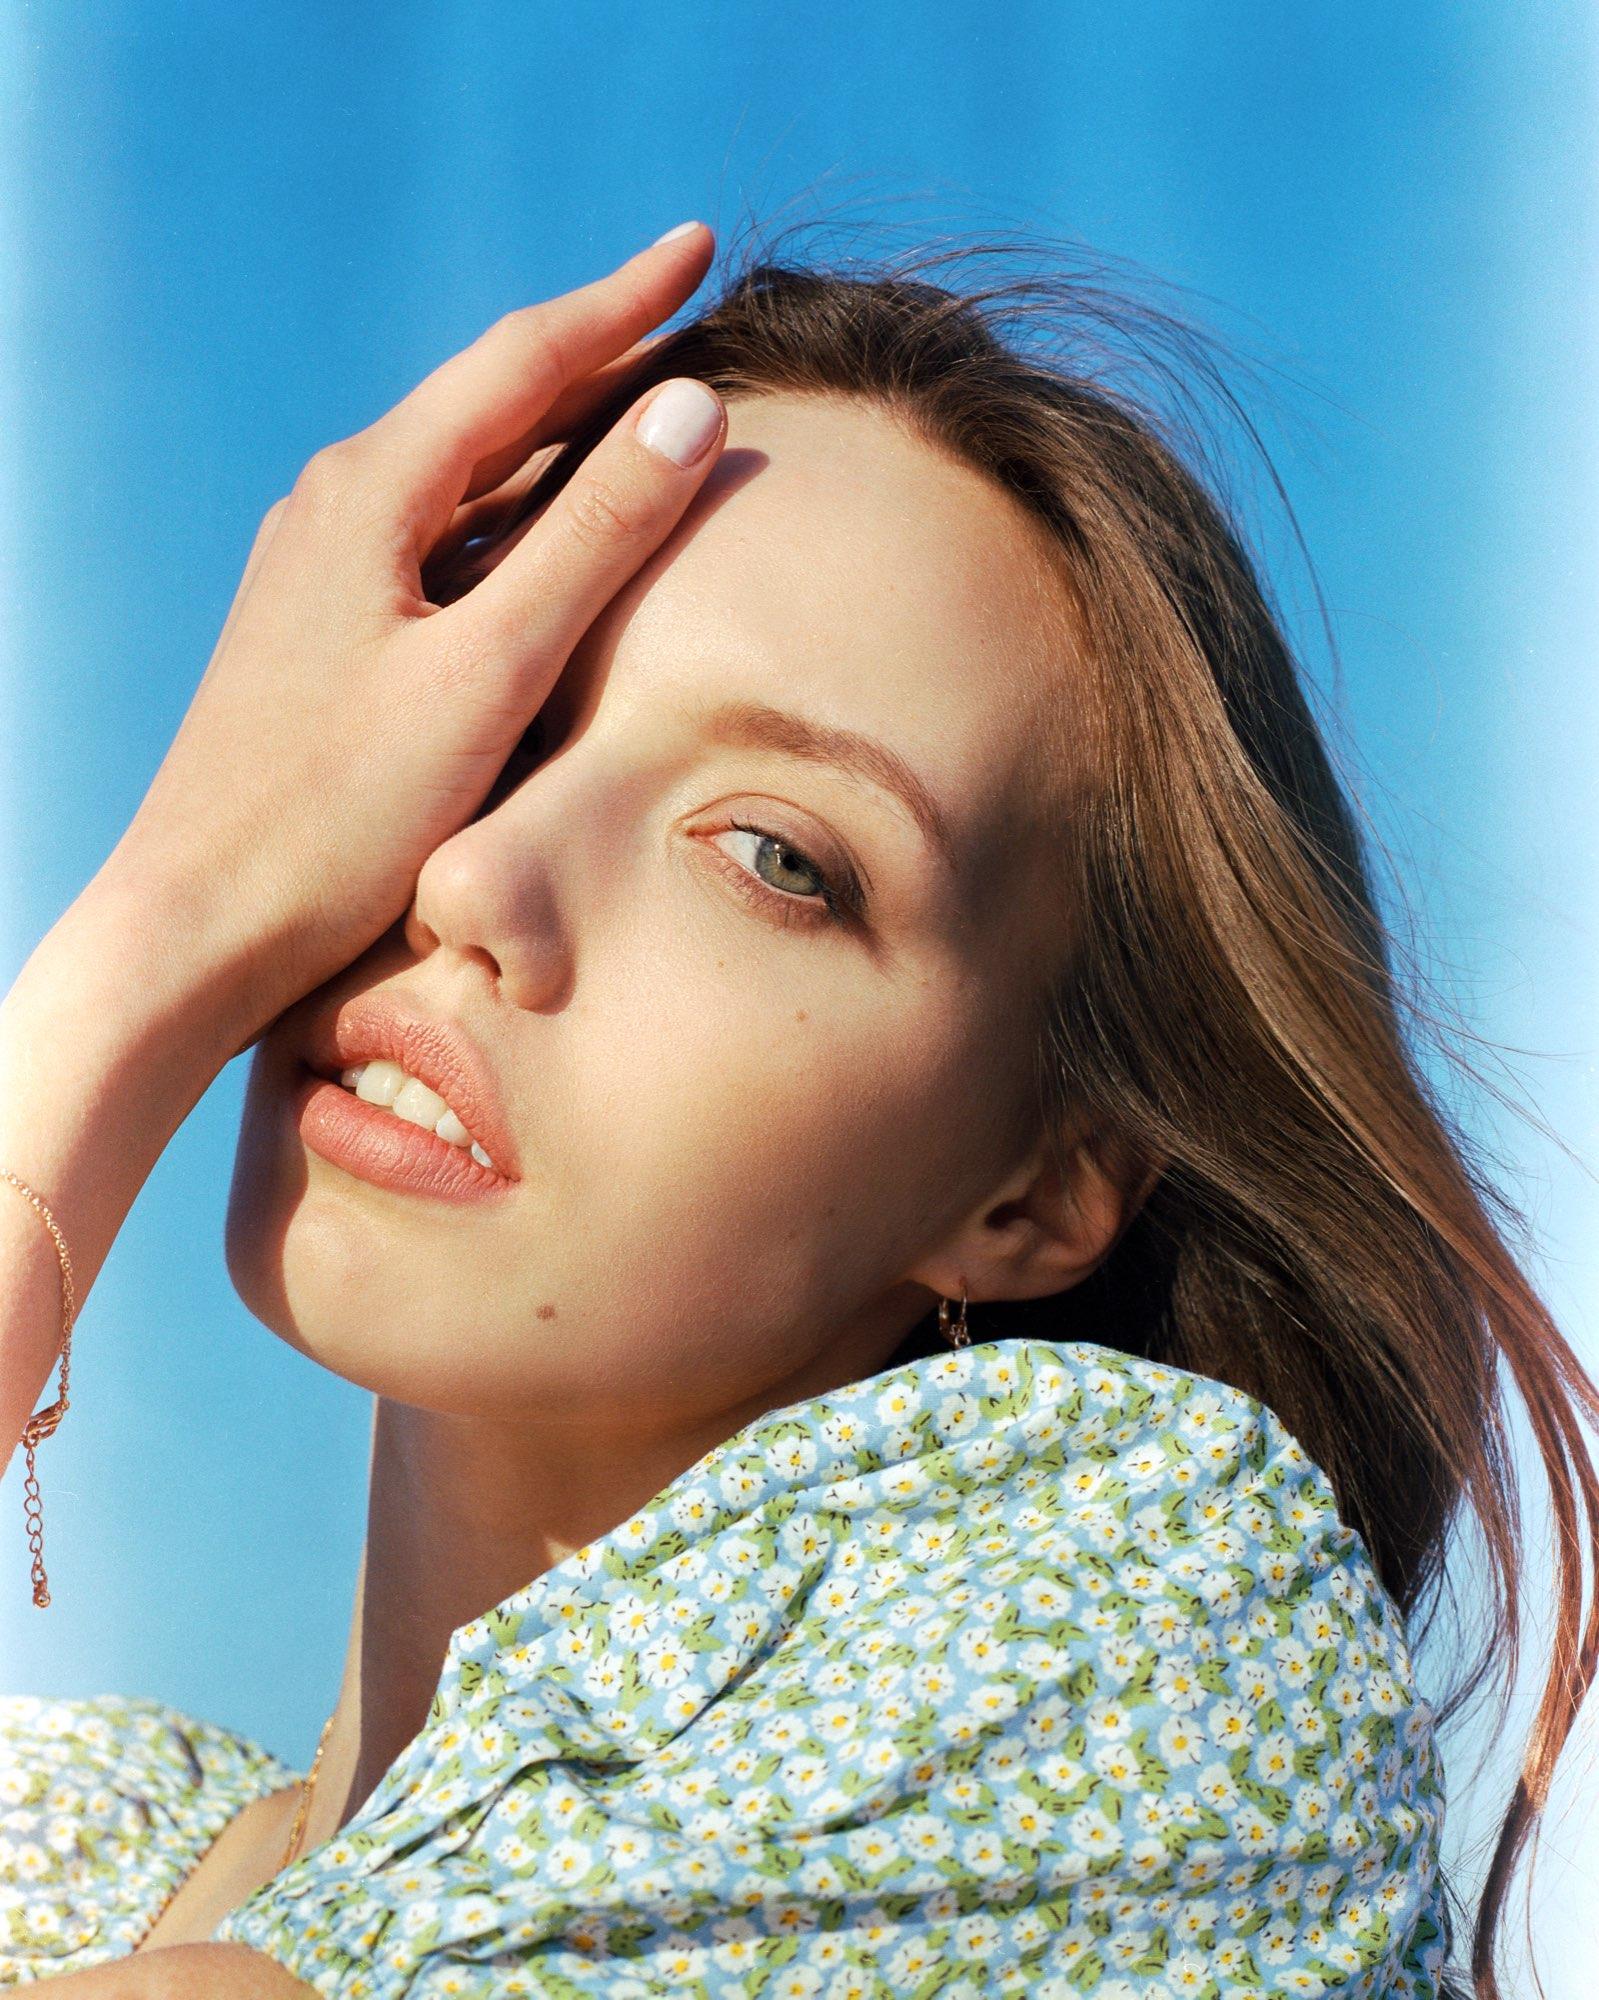 Hair, Nail, Make-up und Fashion styling portfolio / julia-jauner - h-m-dosenbach-ID730-3.jpeg?v=1627307128